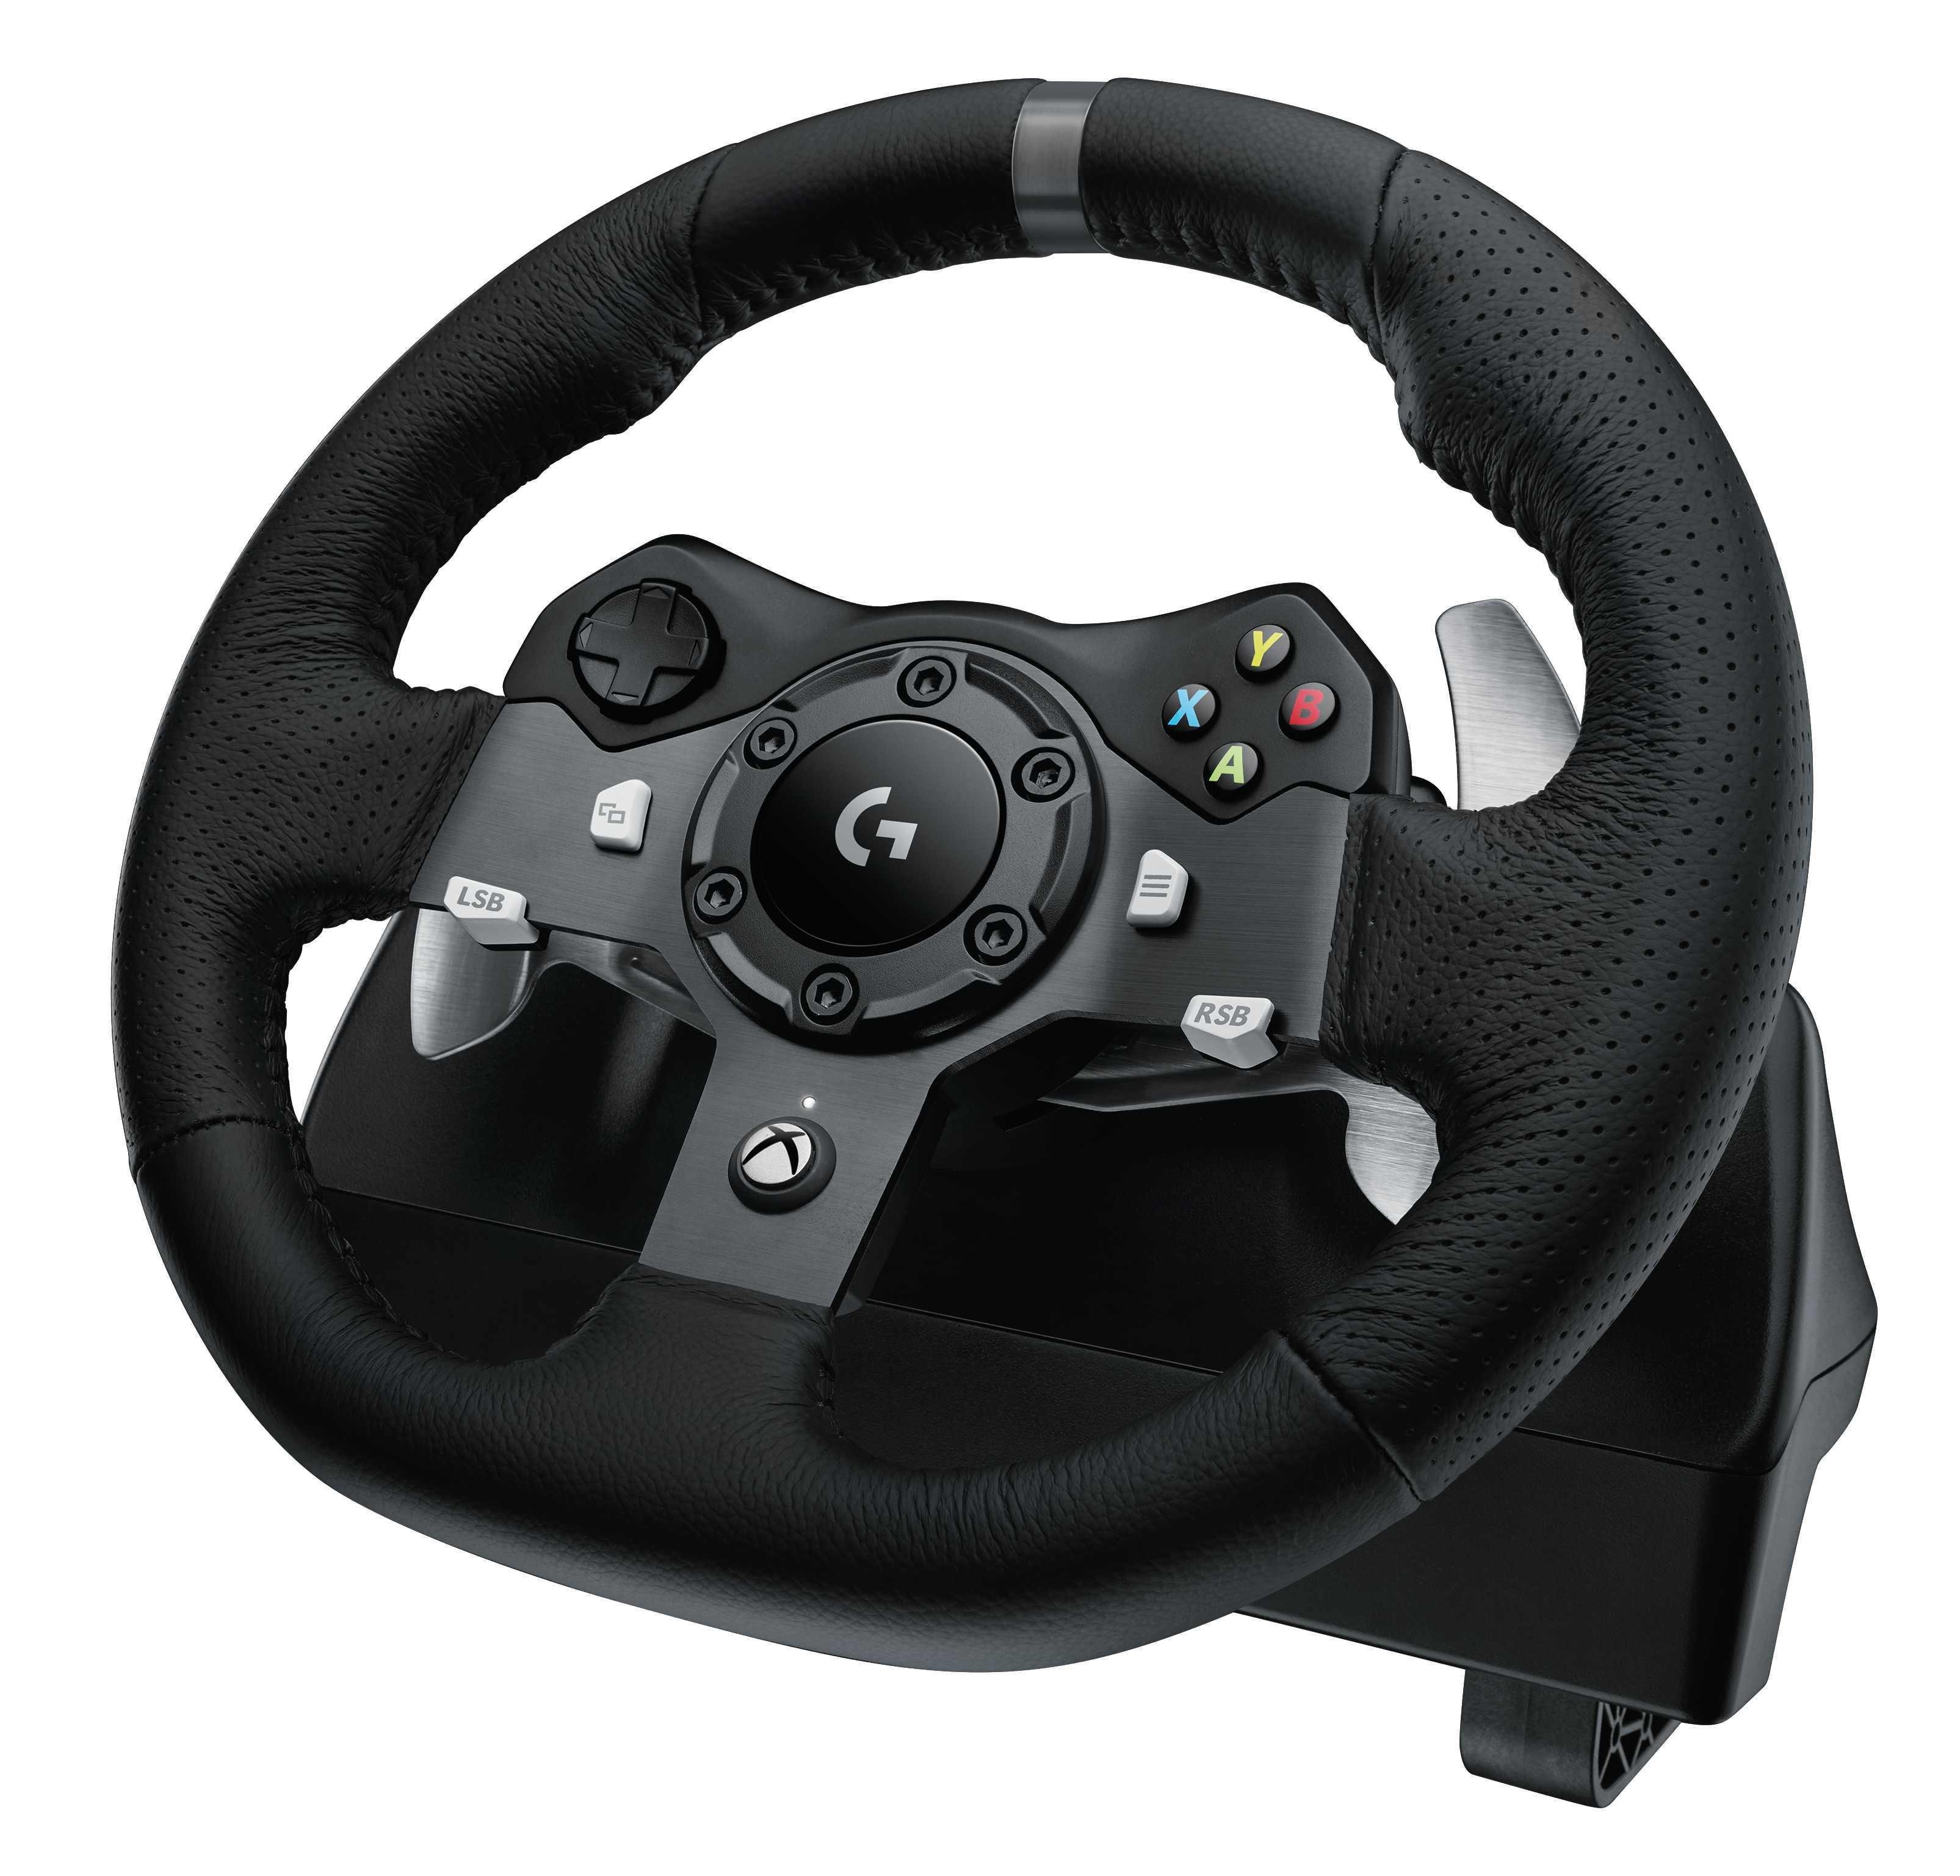 Logitech force feedback racing wheel 600 01